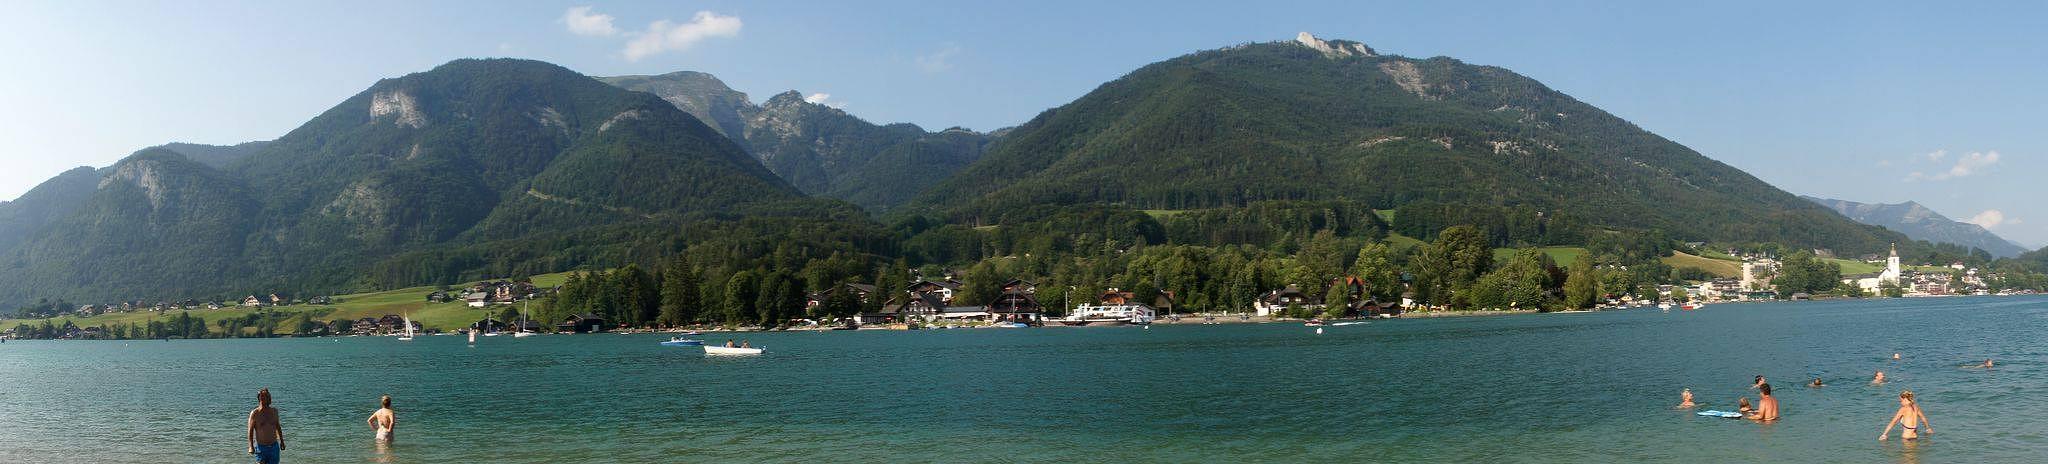 Wolfgangsee, Austria by hunyadigeza